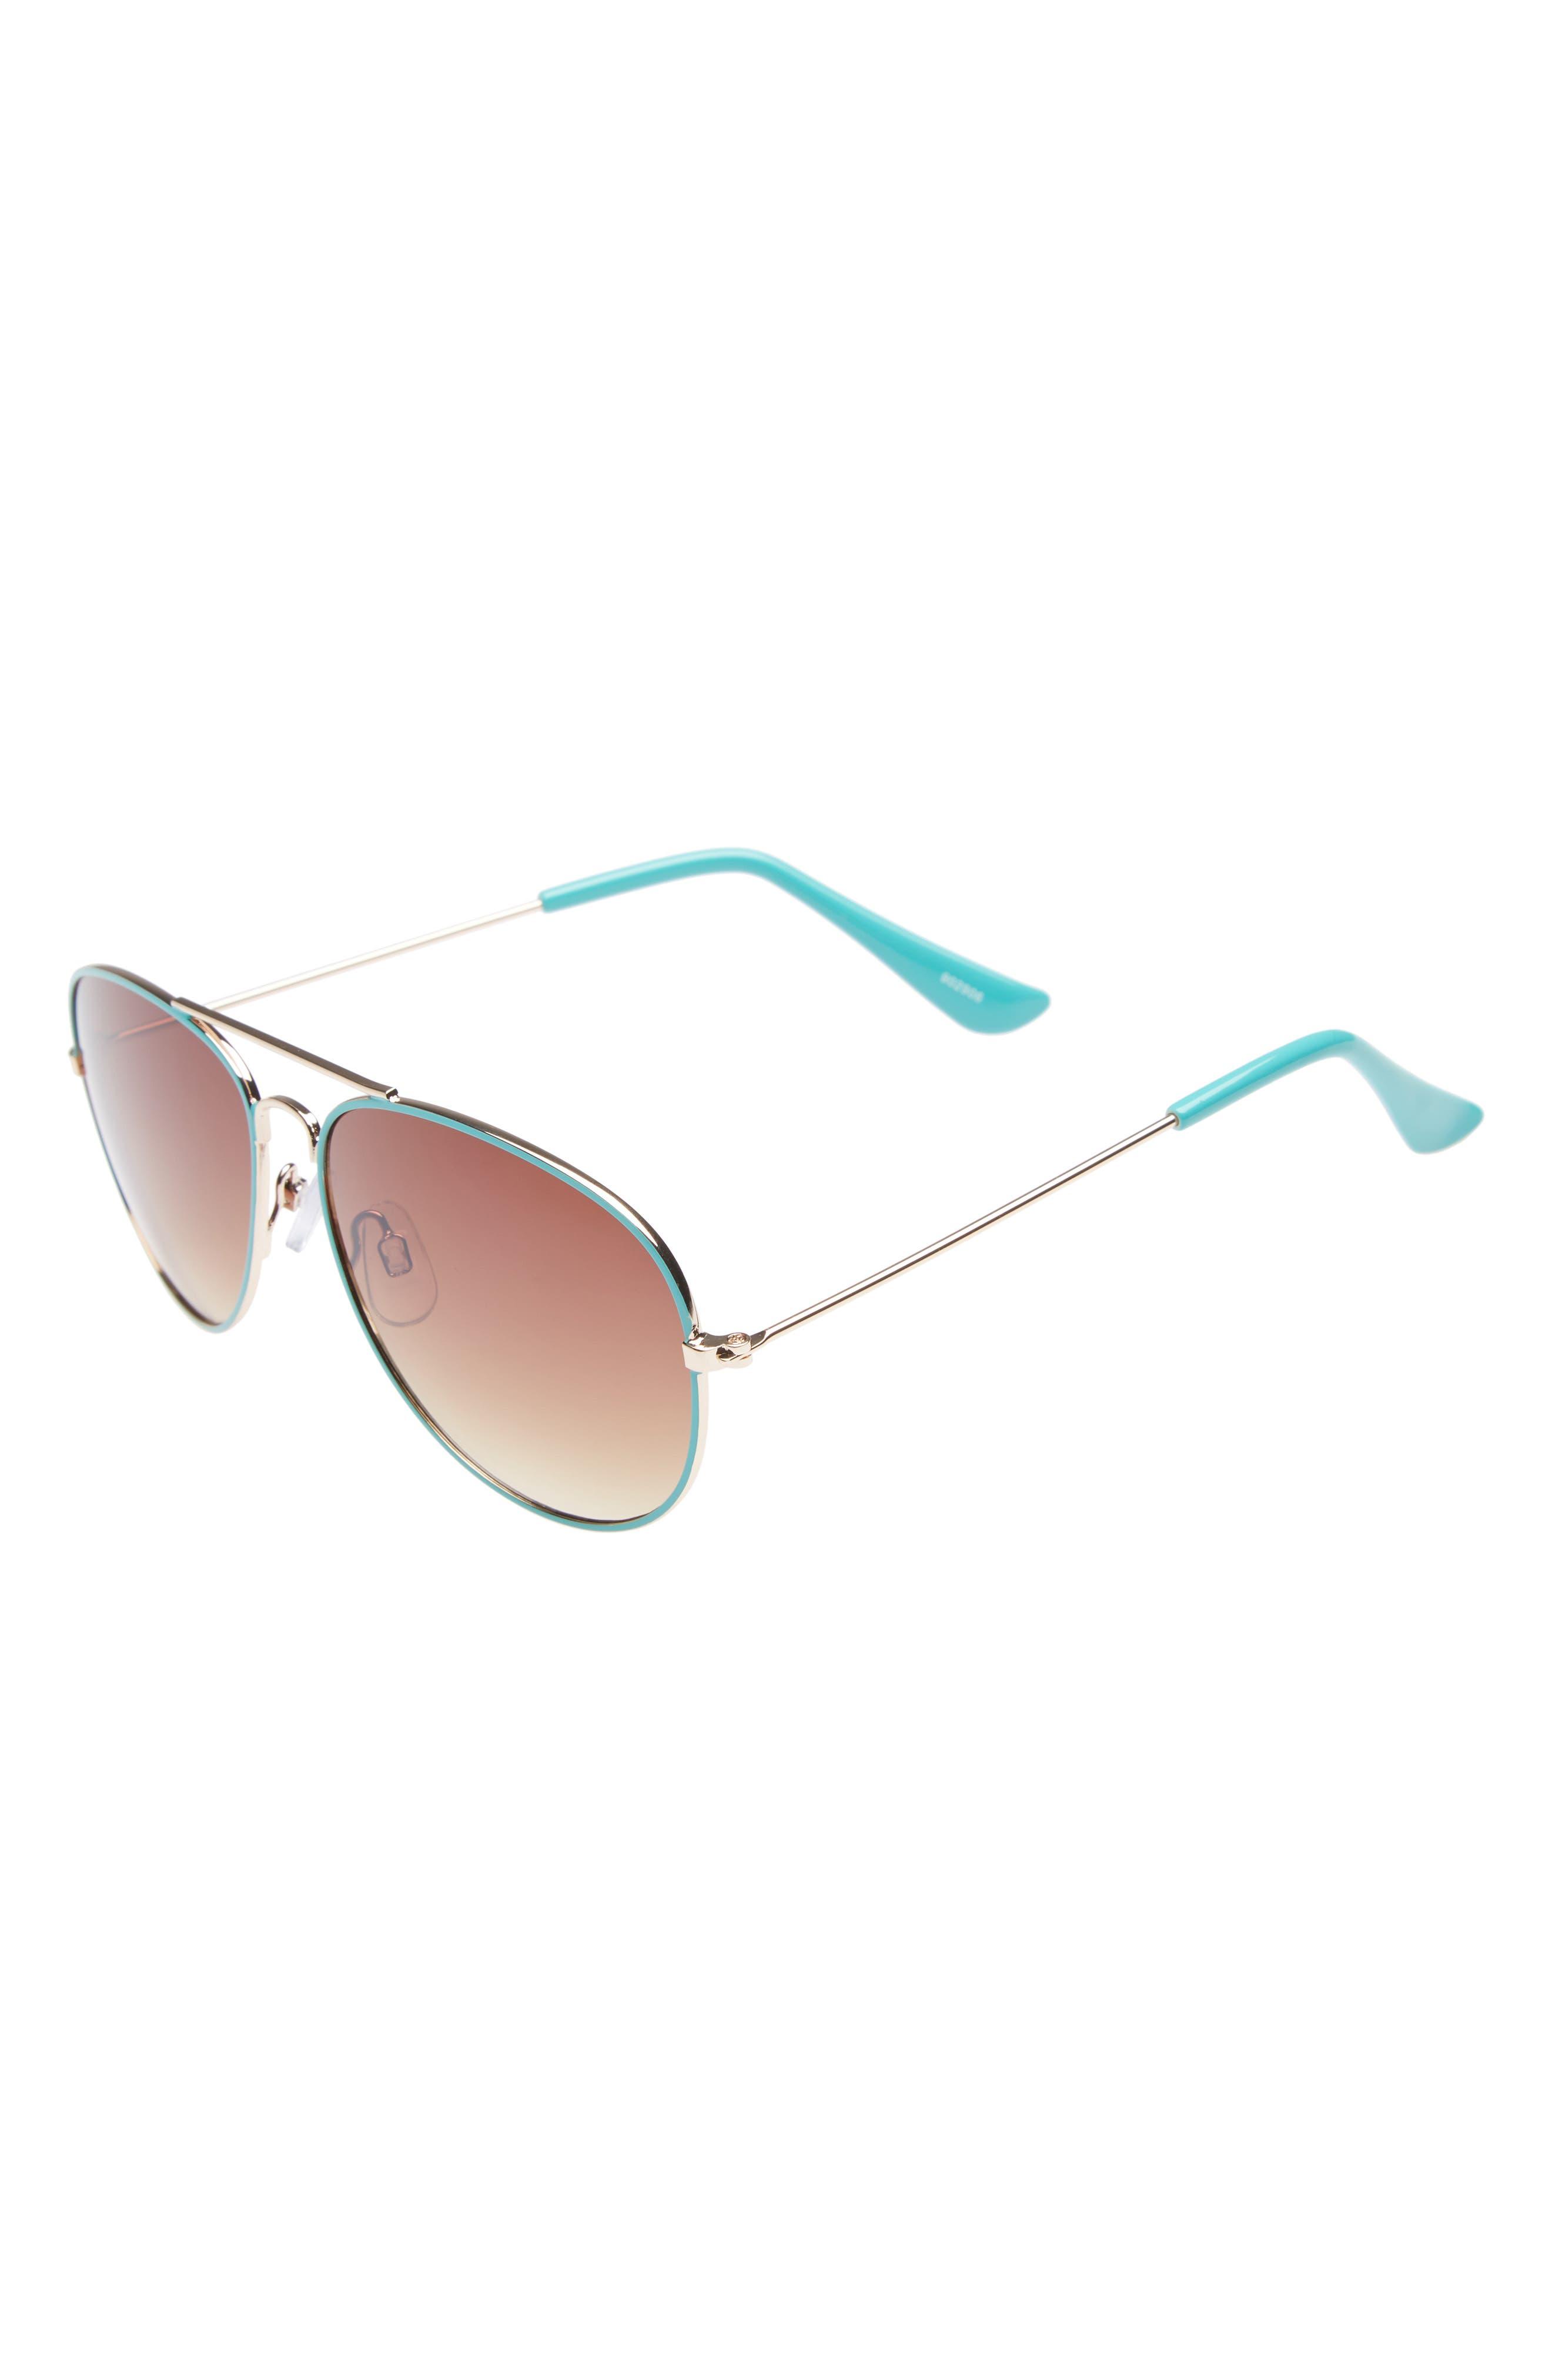 Aviator Sunglasses,                             Main thumbnail 1, color,                             Gold